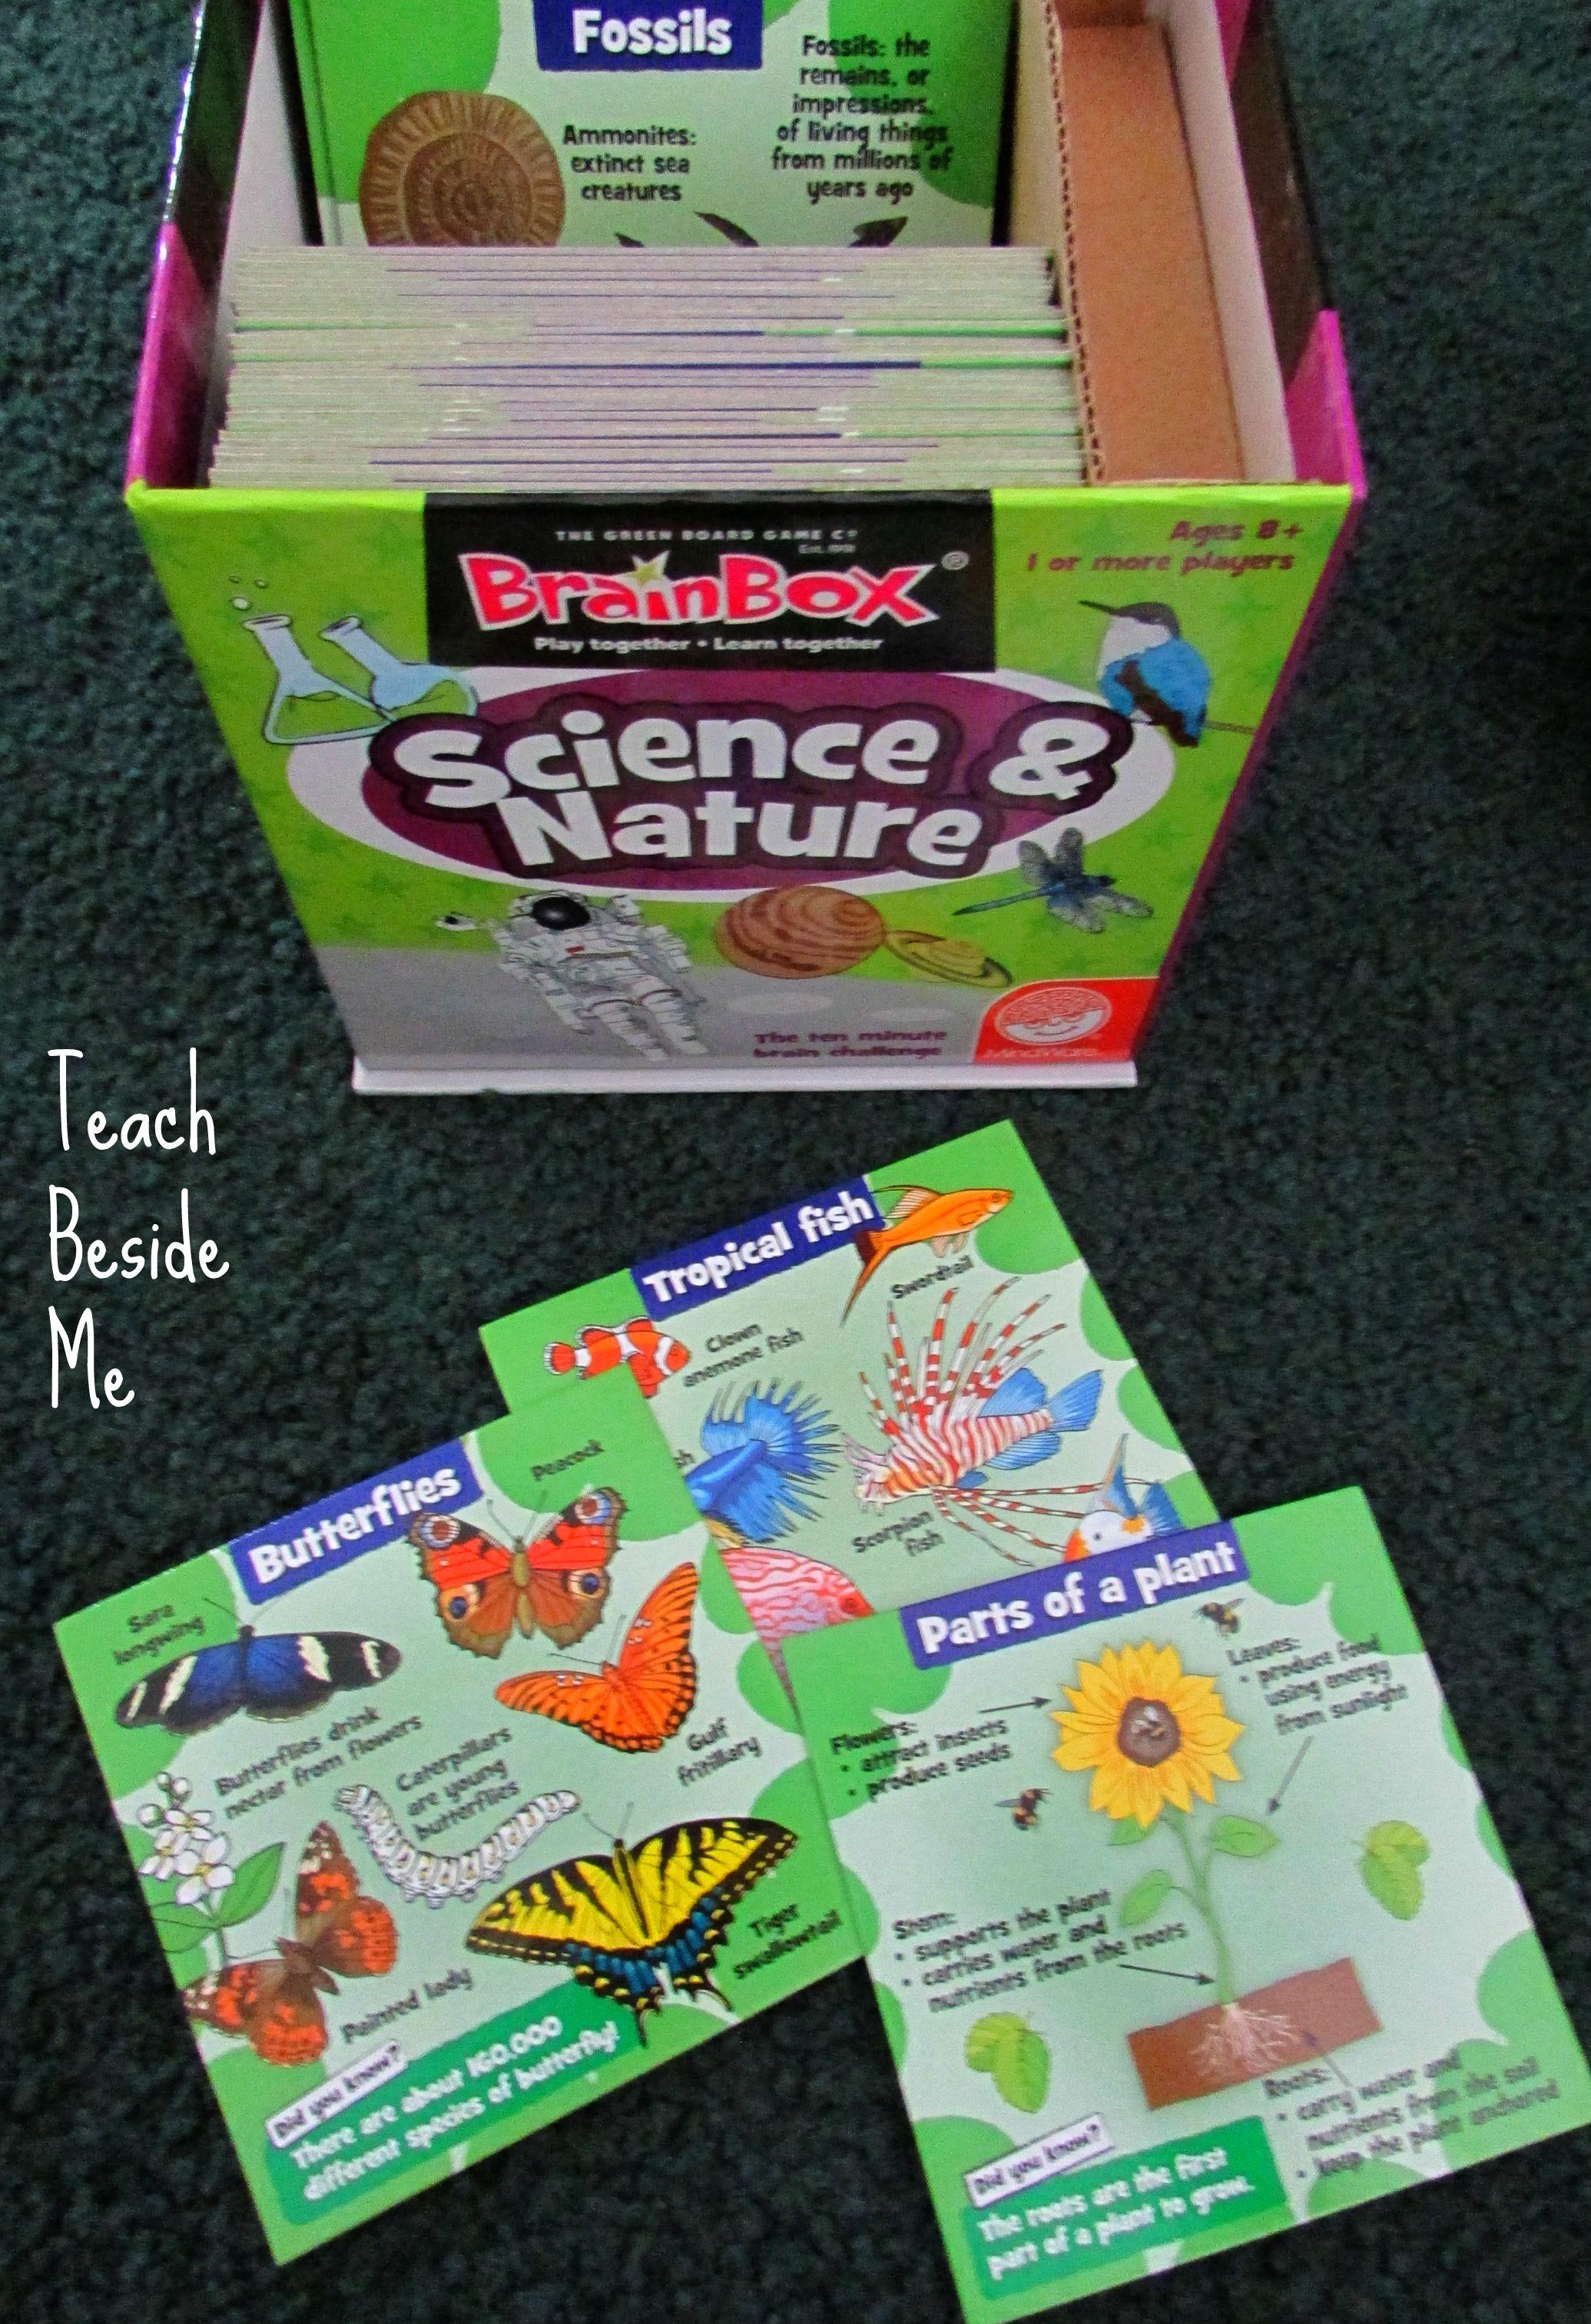 BrainBox Learning Games